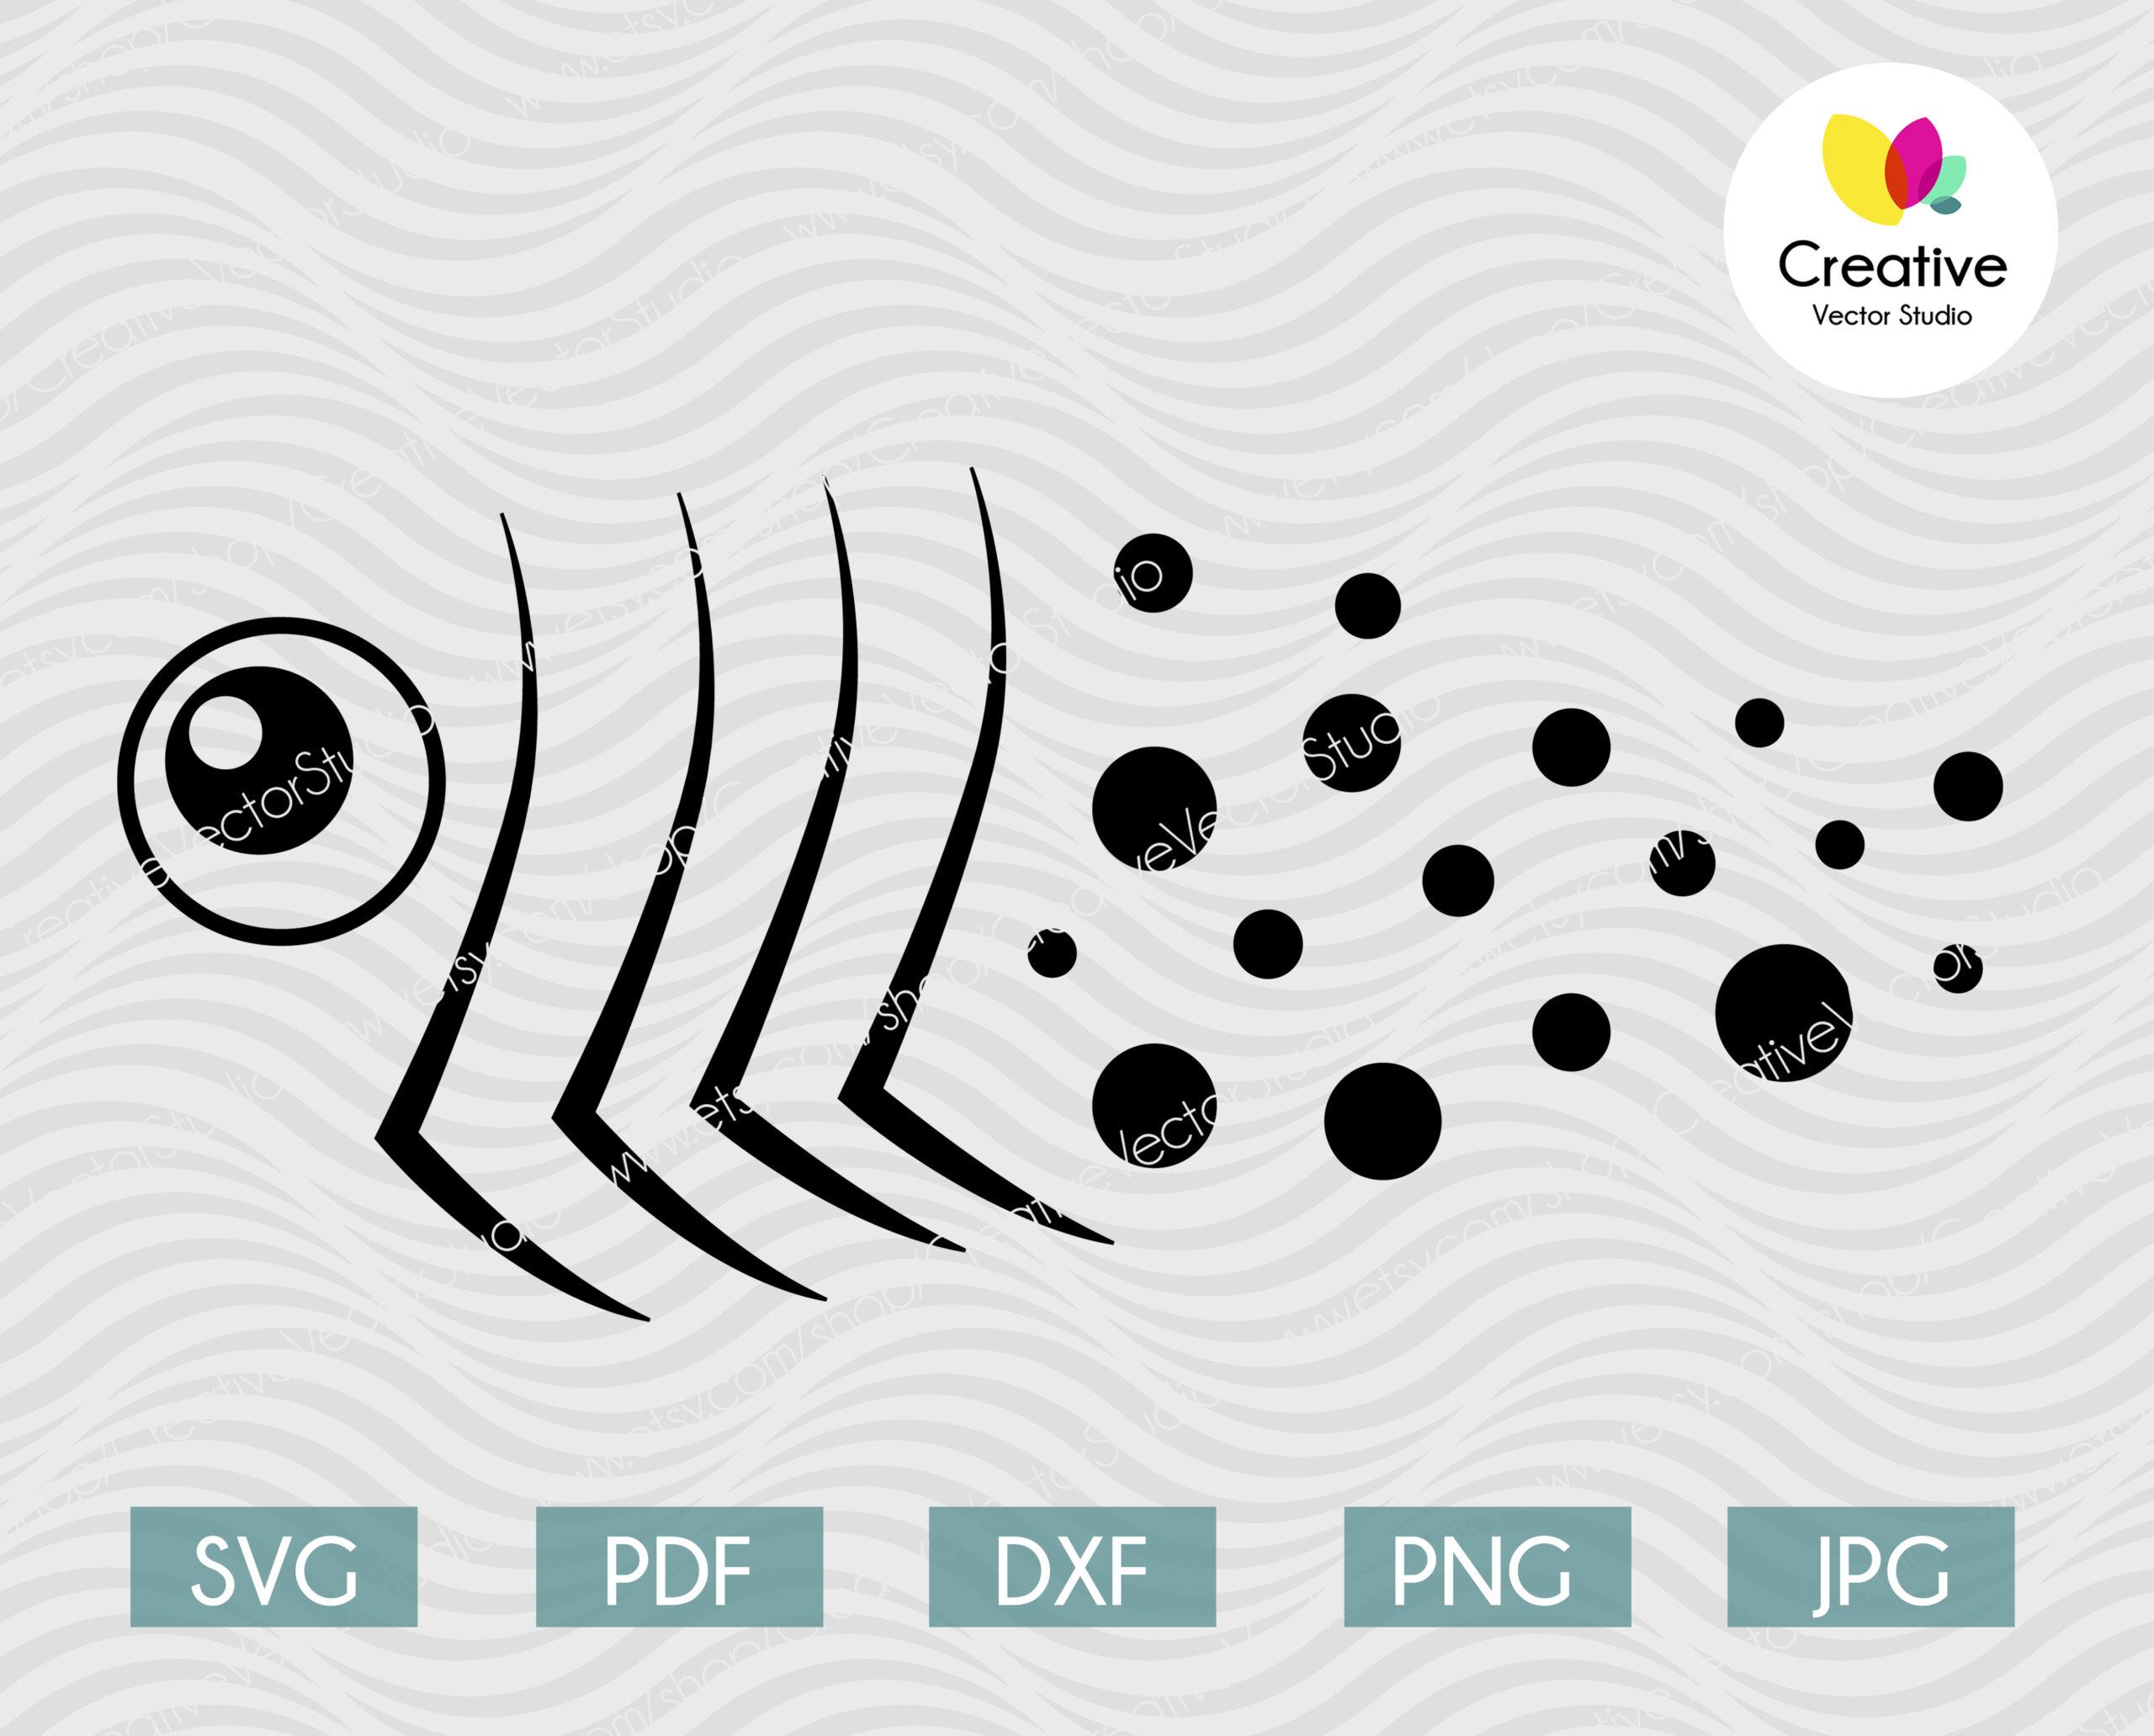 Download Fishing Lure Svg 21 Cut File Image Creative Vector Studio